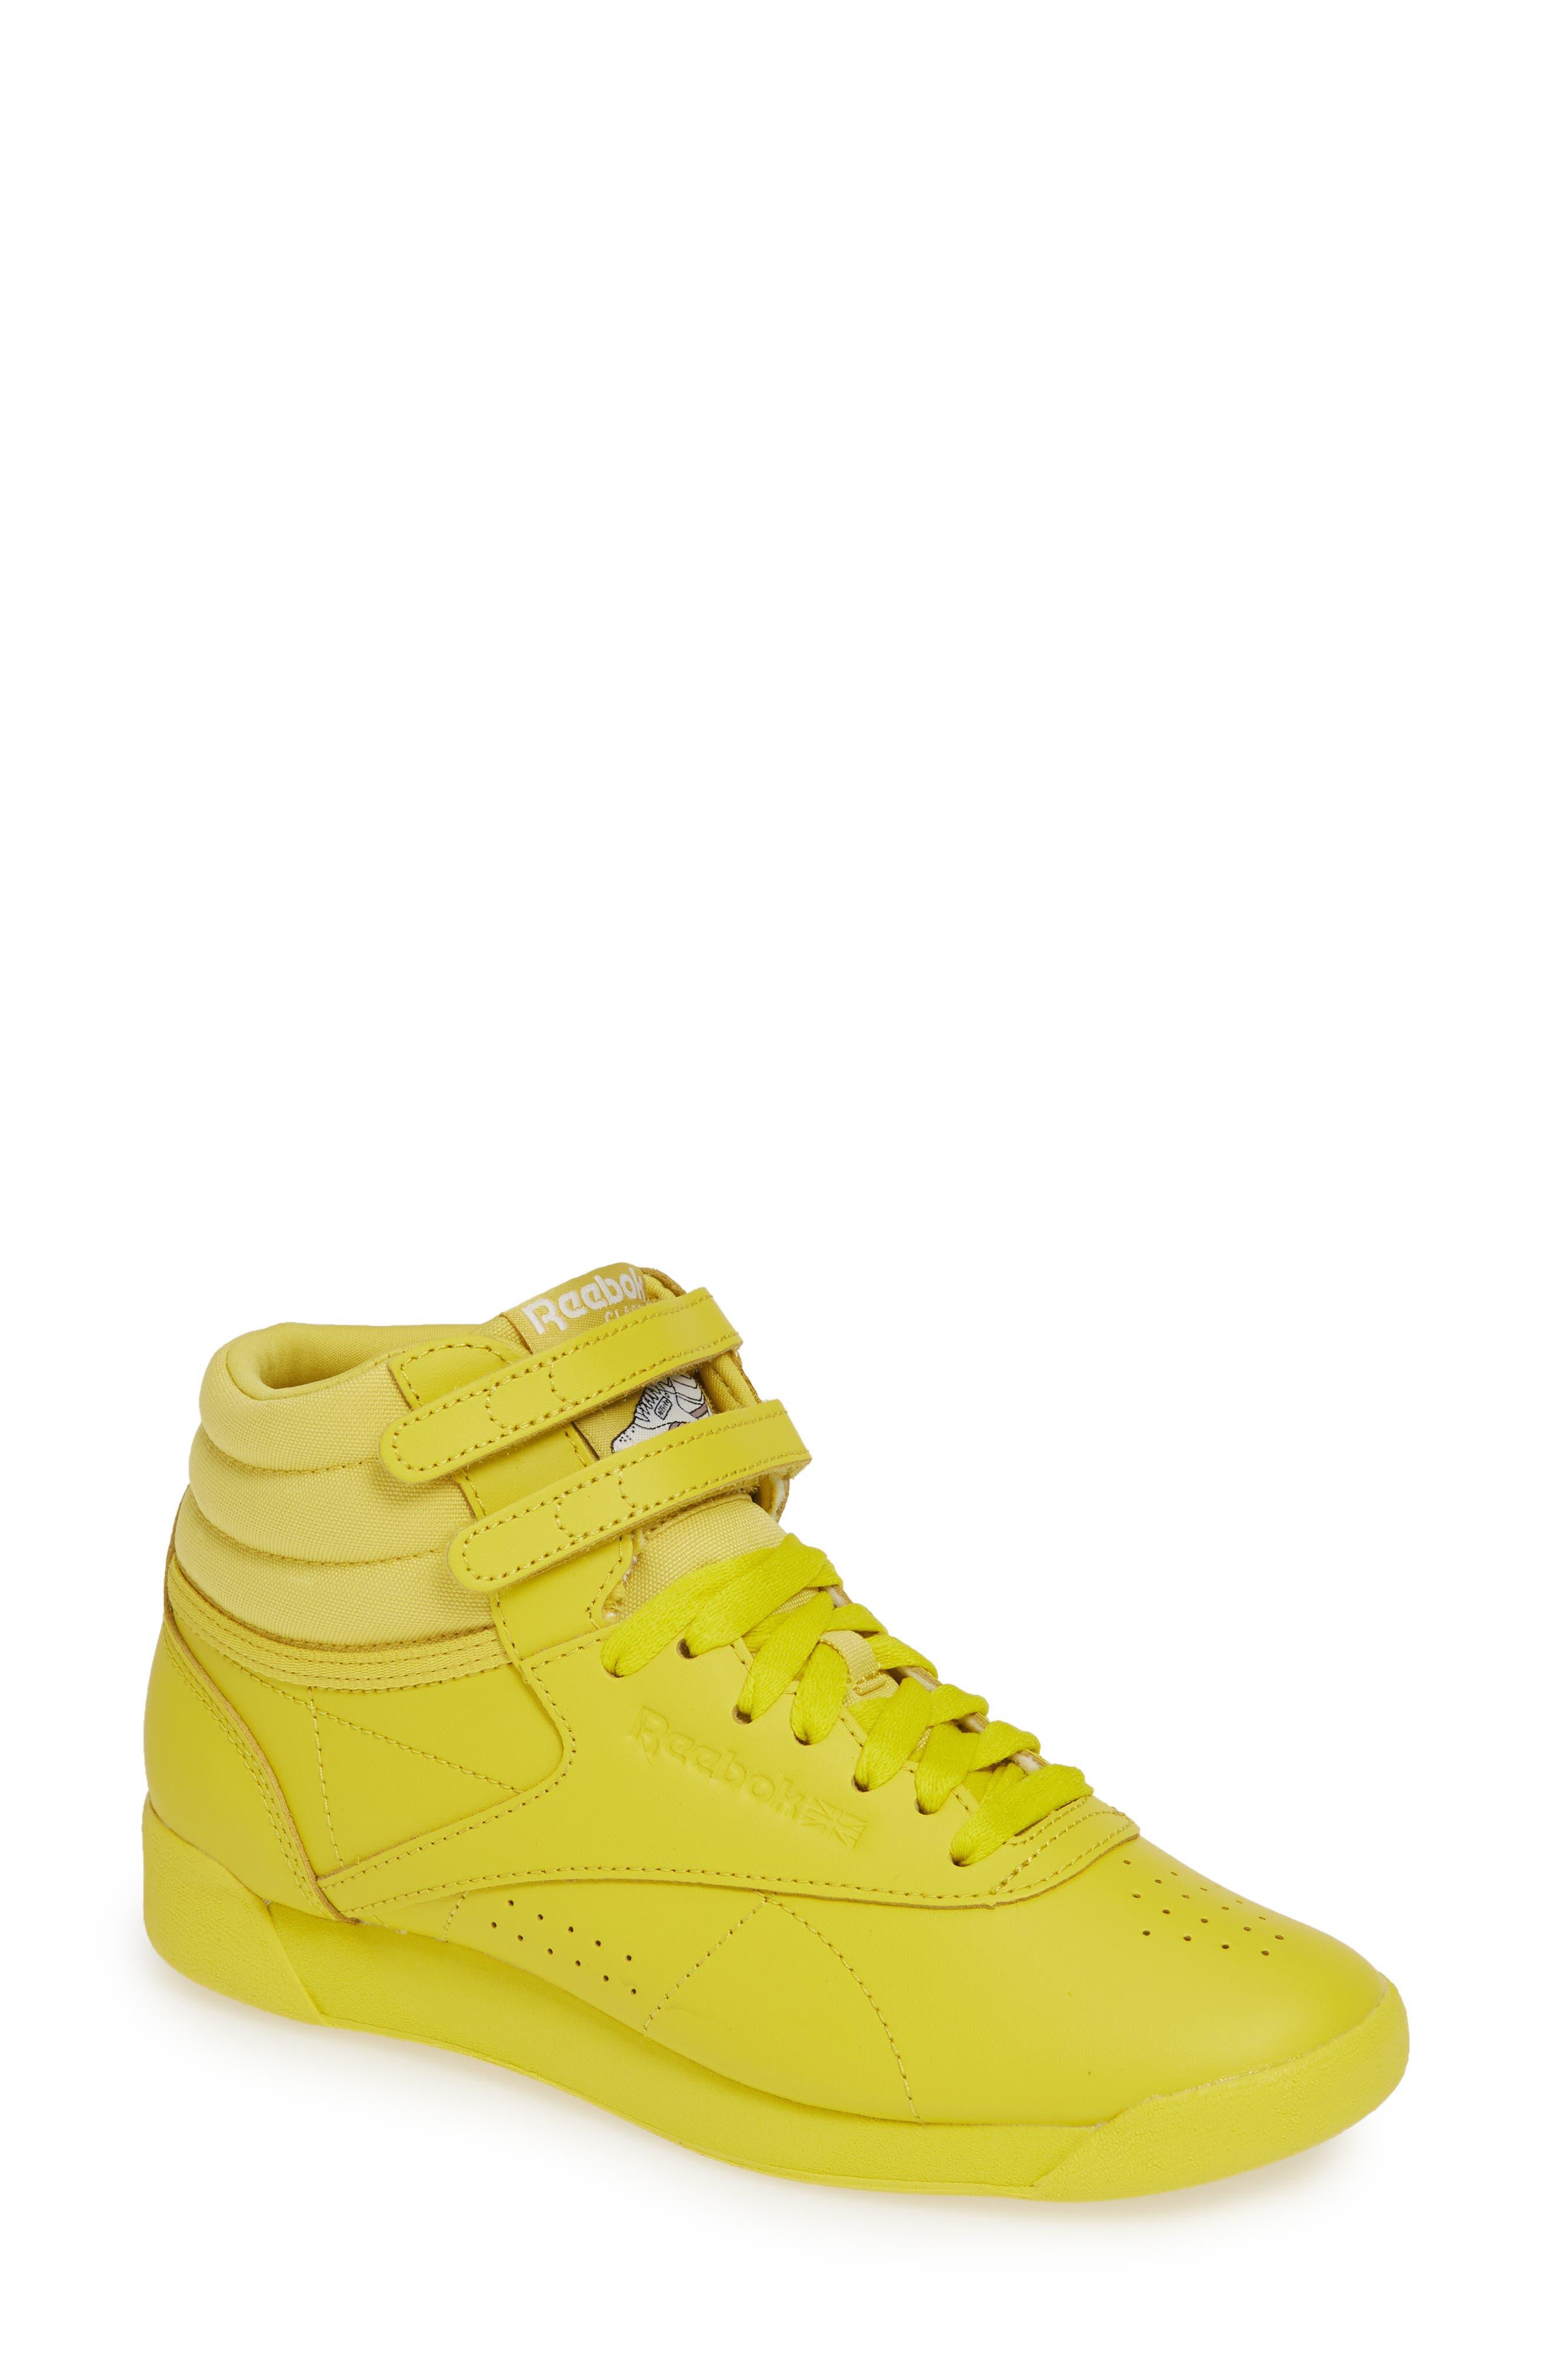 64a317c9c951 Reebok Women s Shoes